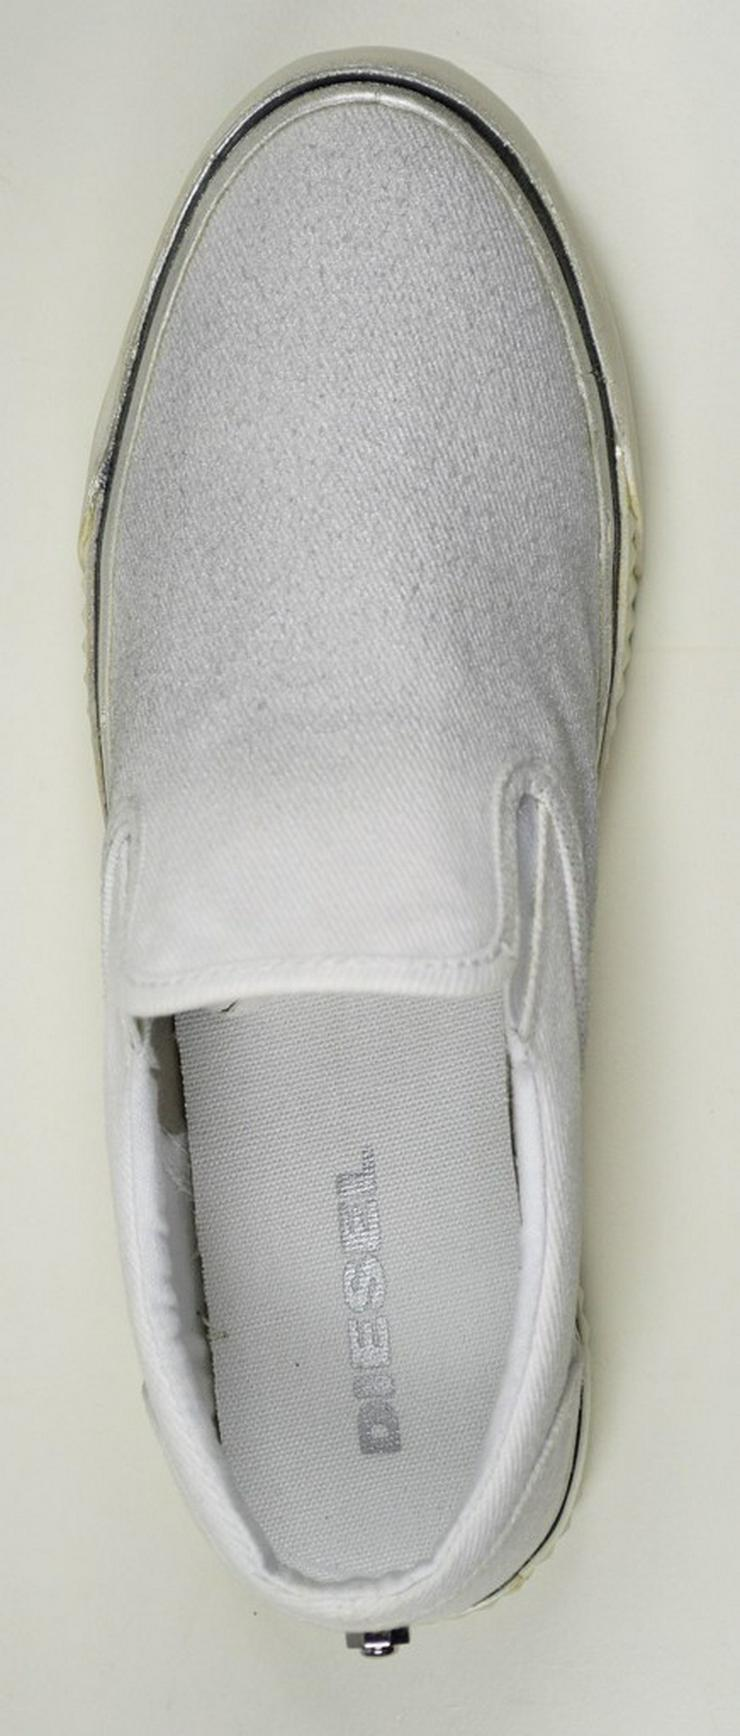 Bild 5: Diesel Slipper Sneaker für Abholer 19051830